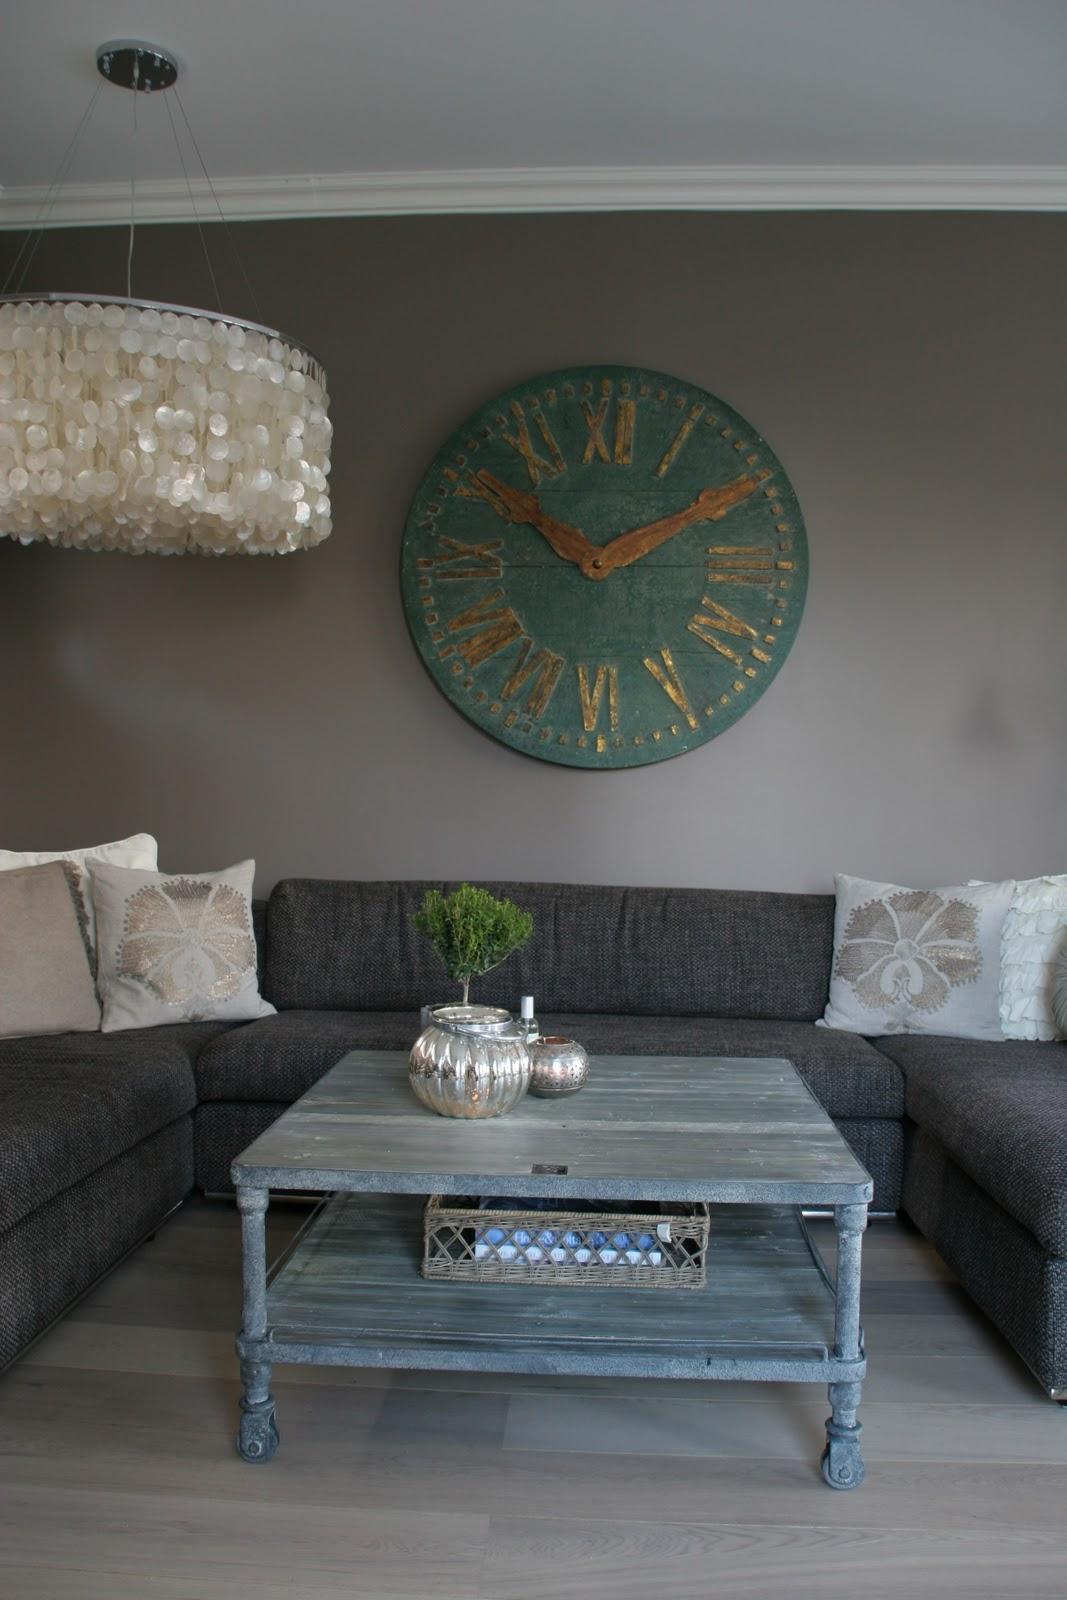 nytt bord villa von krogh. Black Bedroom Furniture Sets. Home Design Ideas